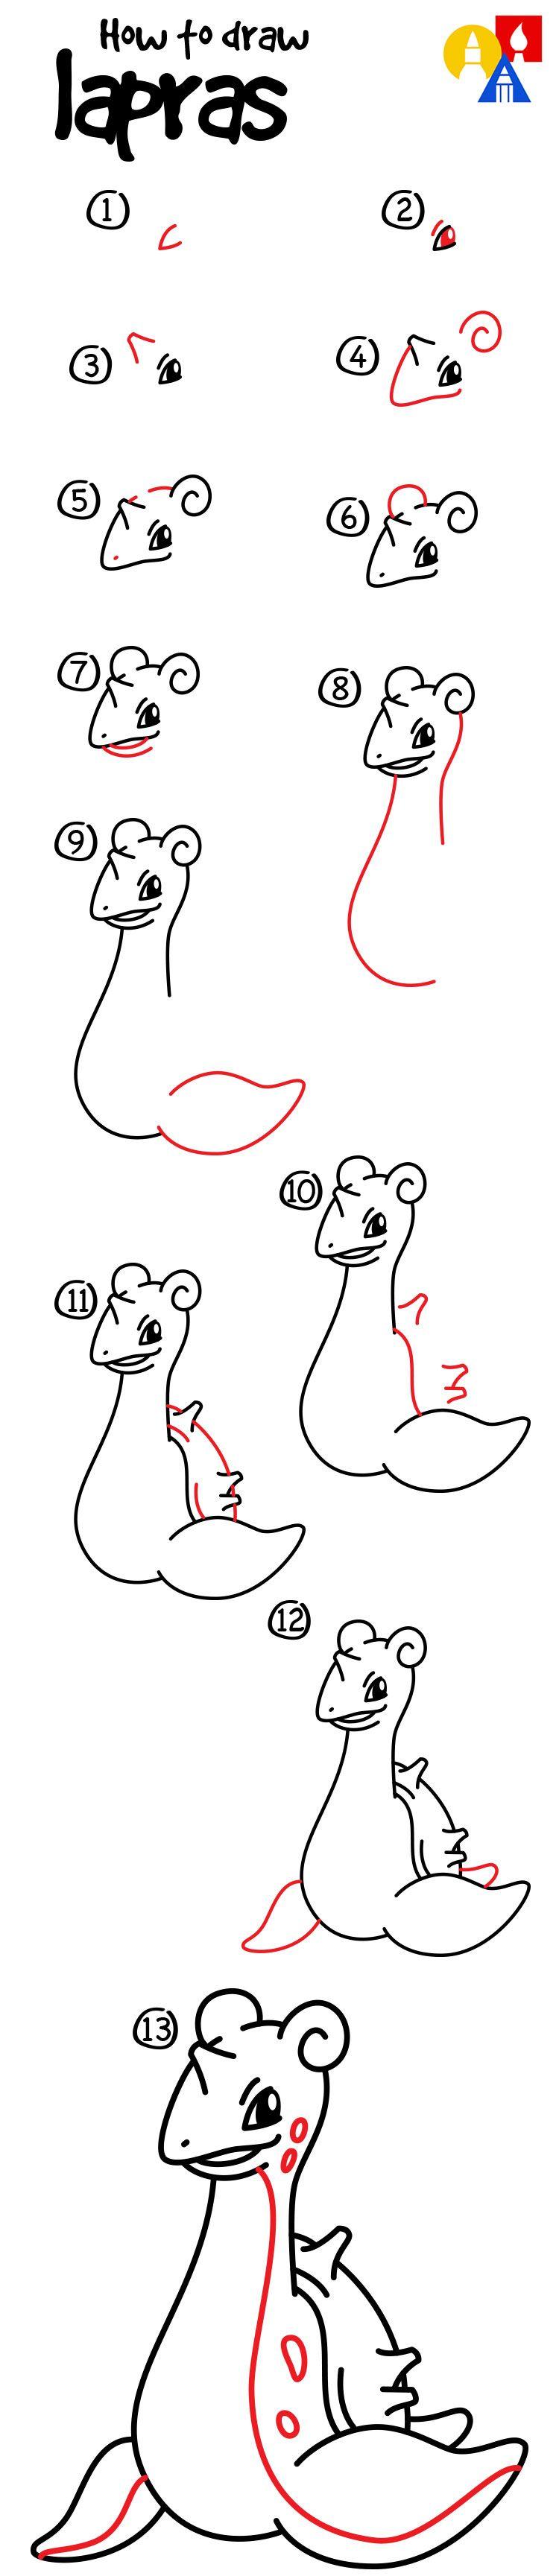 How To Draw Lapras - Art For Kids Hub -